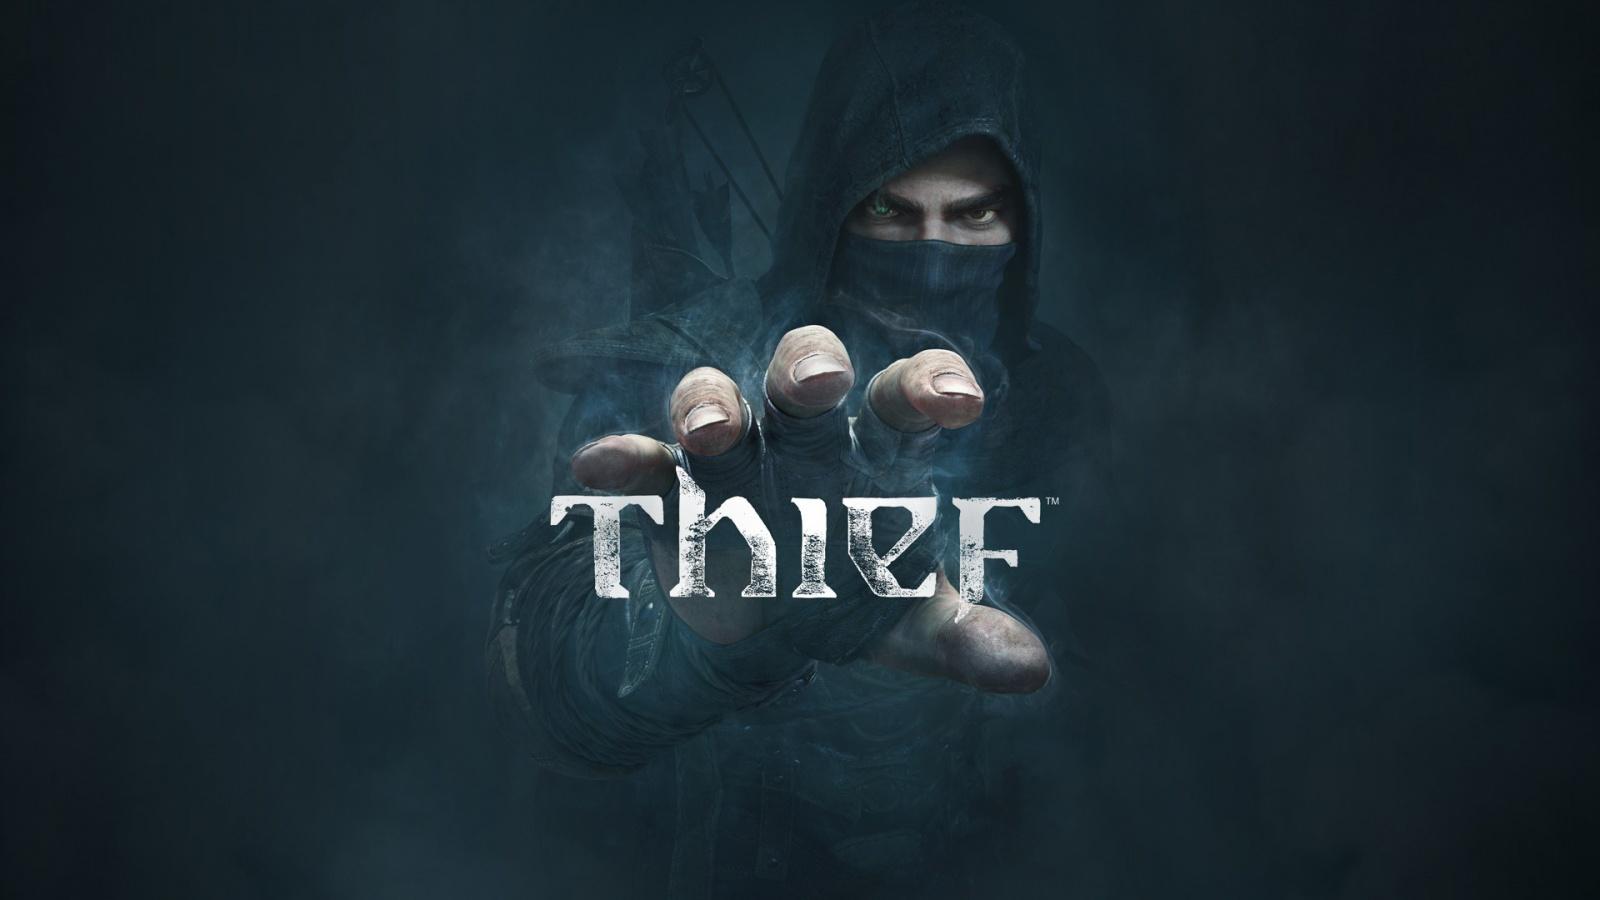 thief wallpaper